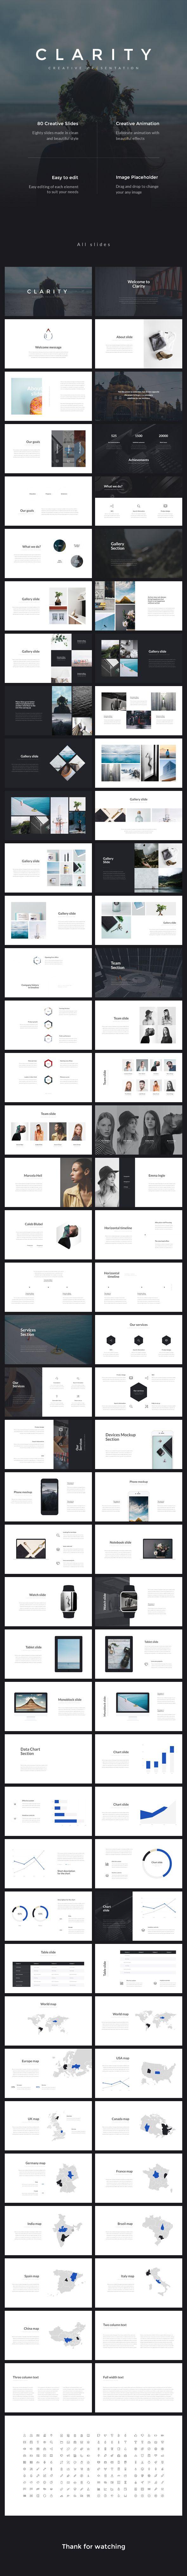 Clarity PowerPoint Presentation - PowerPoint Templates Presentation Templates Download here: https://graphicriver.net/item/clarity-powerpoint-presentation/17757906?ref=classicdesignp